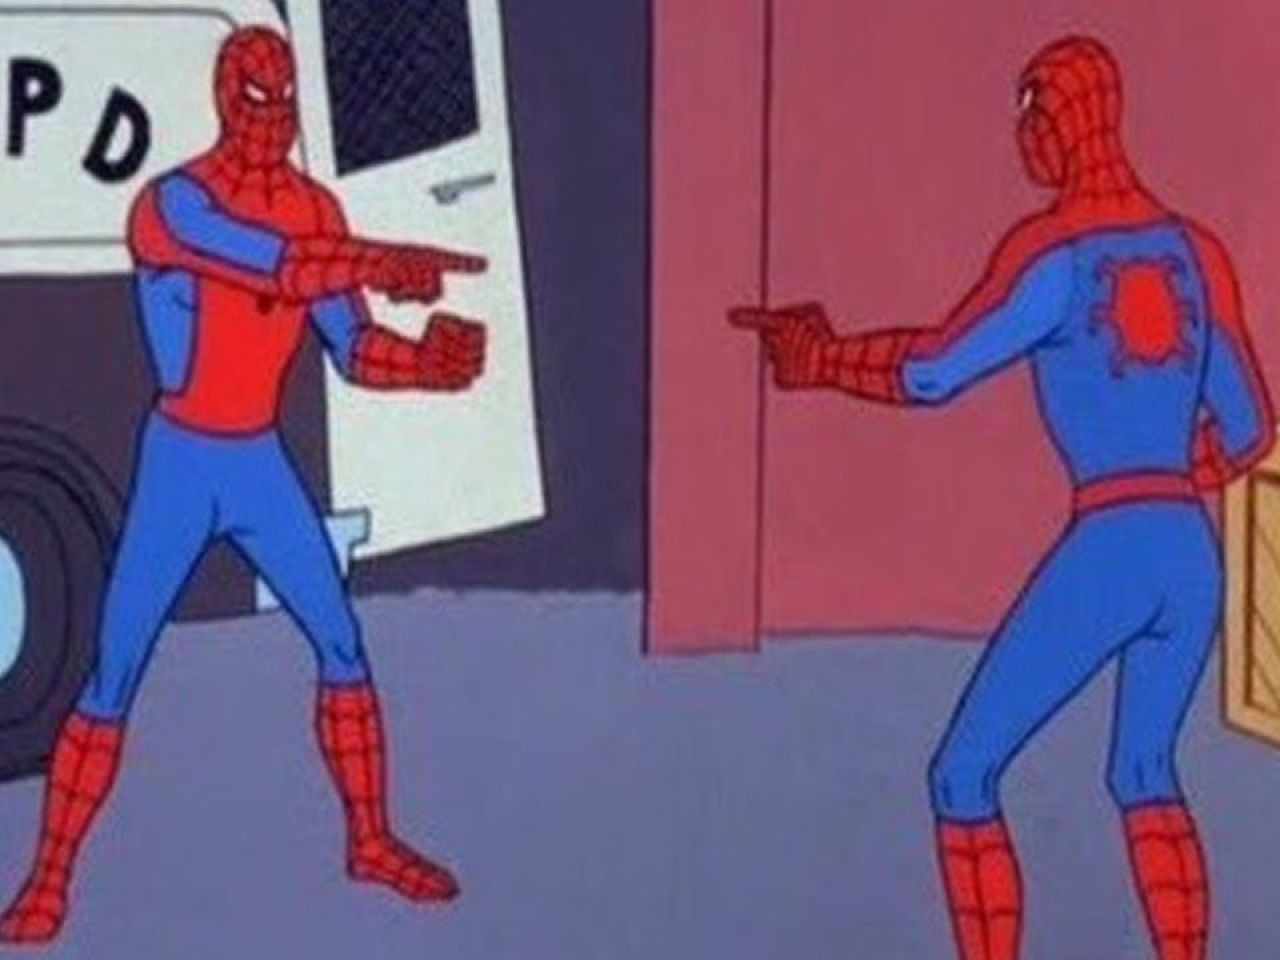 spider-man-nuovo-funko-pop-riprende-meme